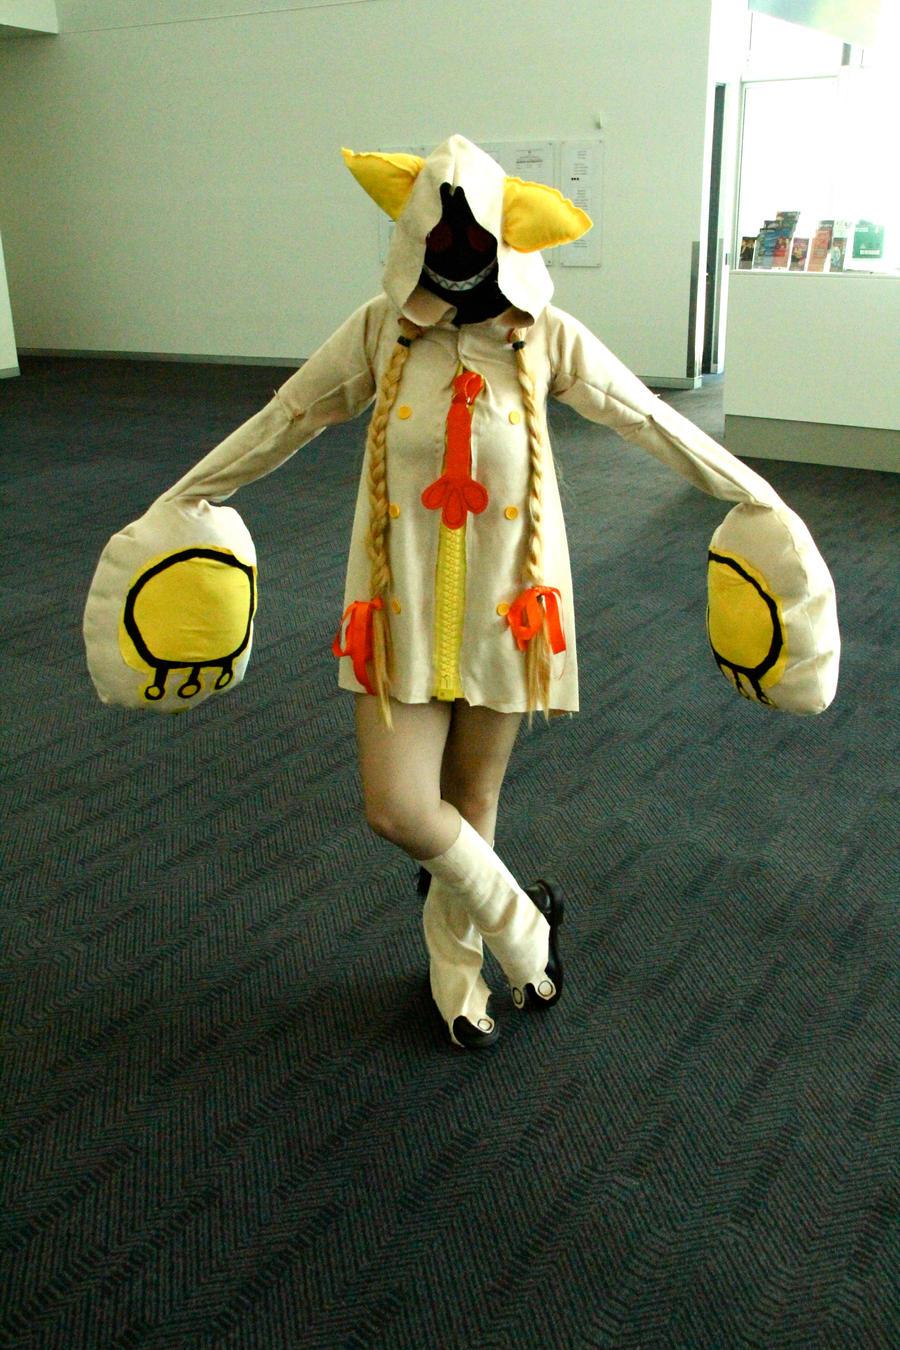 BlazBlue cosplay - Taokaka #2! by NeonSenpai